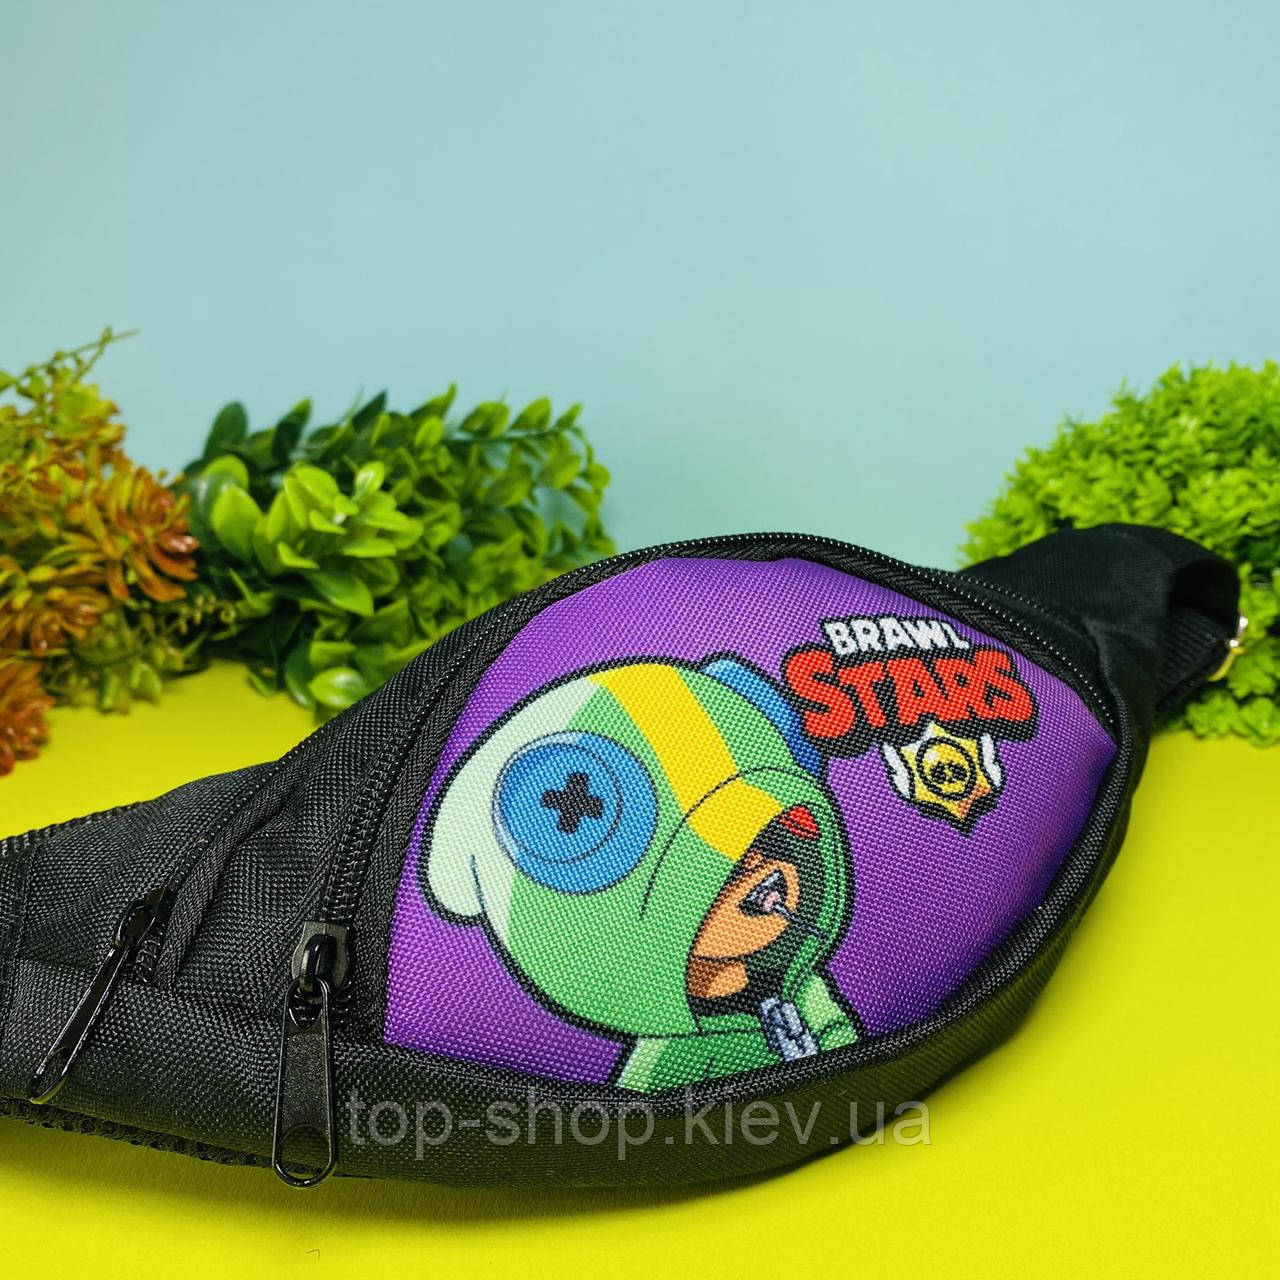 Детская сумка бананка Cappuccino Toys Brawl Stars для мальчика и девочки Бравл Старс